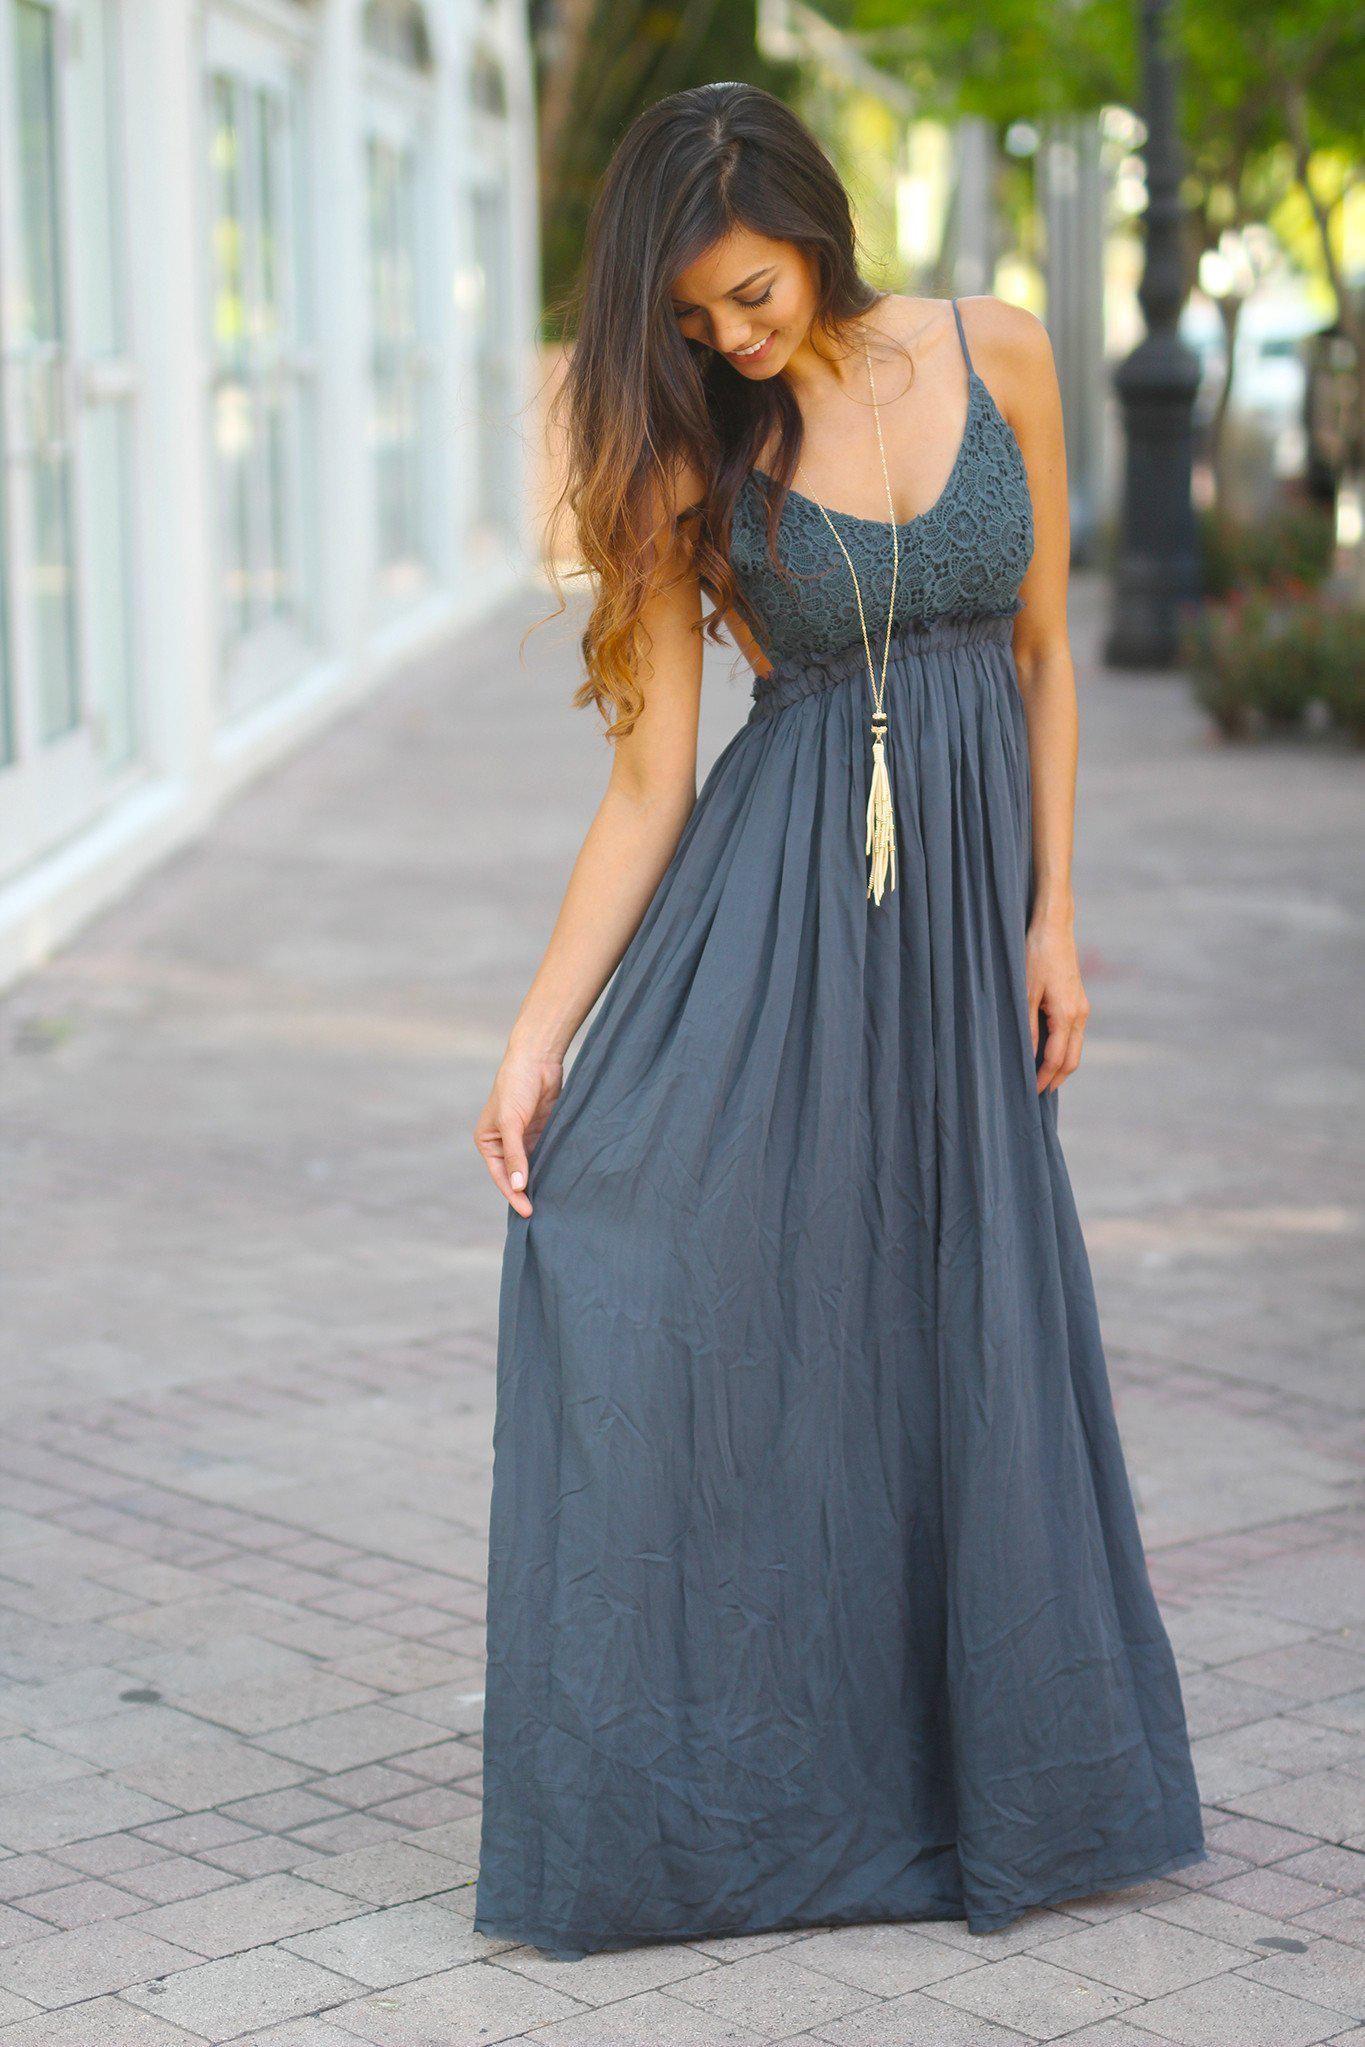 e0df04bfda7 Midnight Navy Lace Maxi Dress With Open Back and Frayed Hem ...